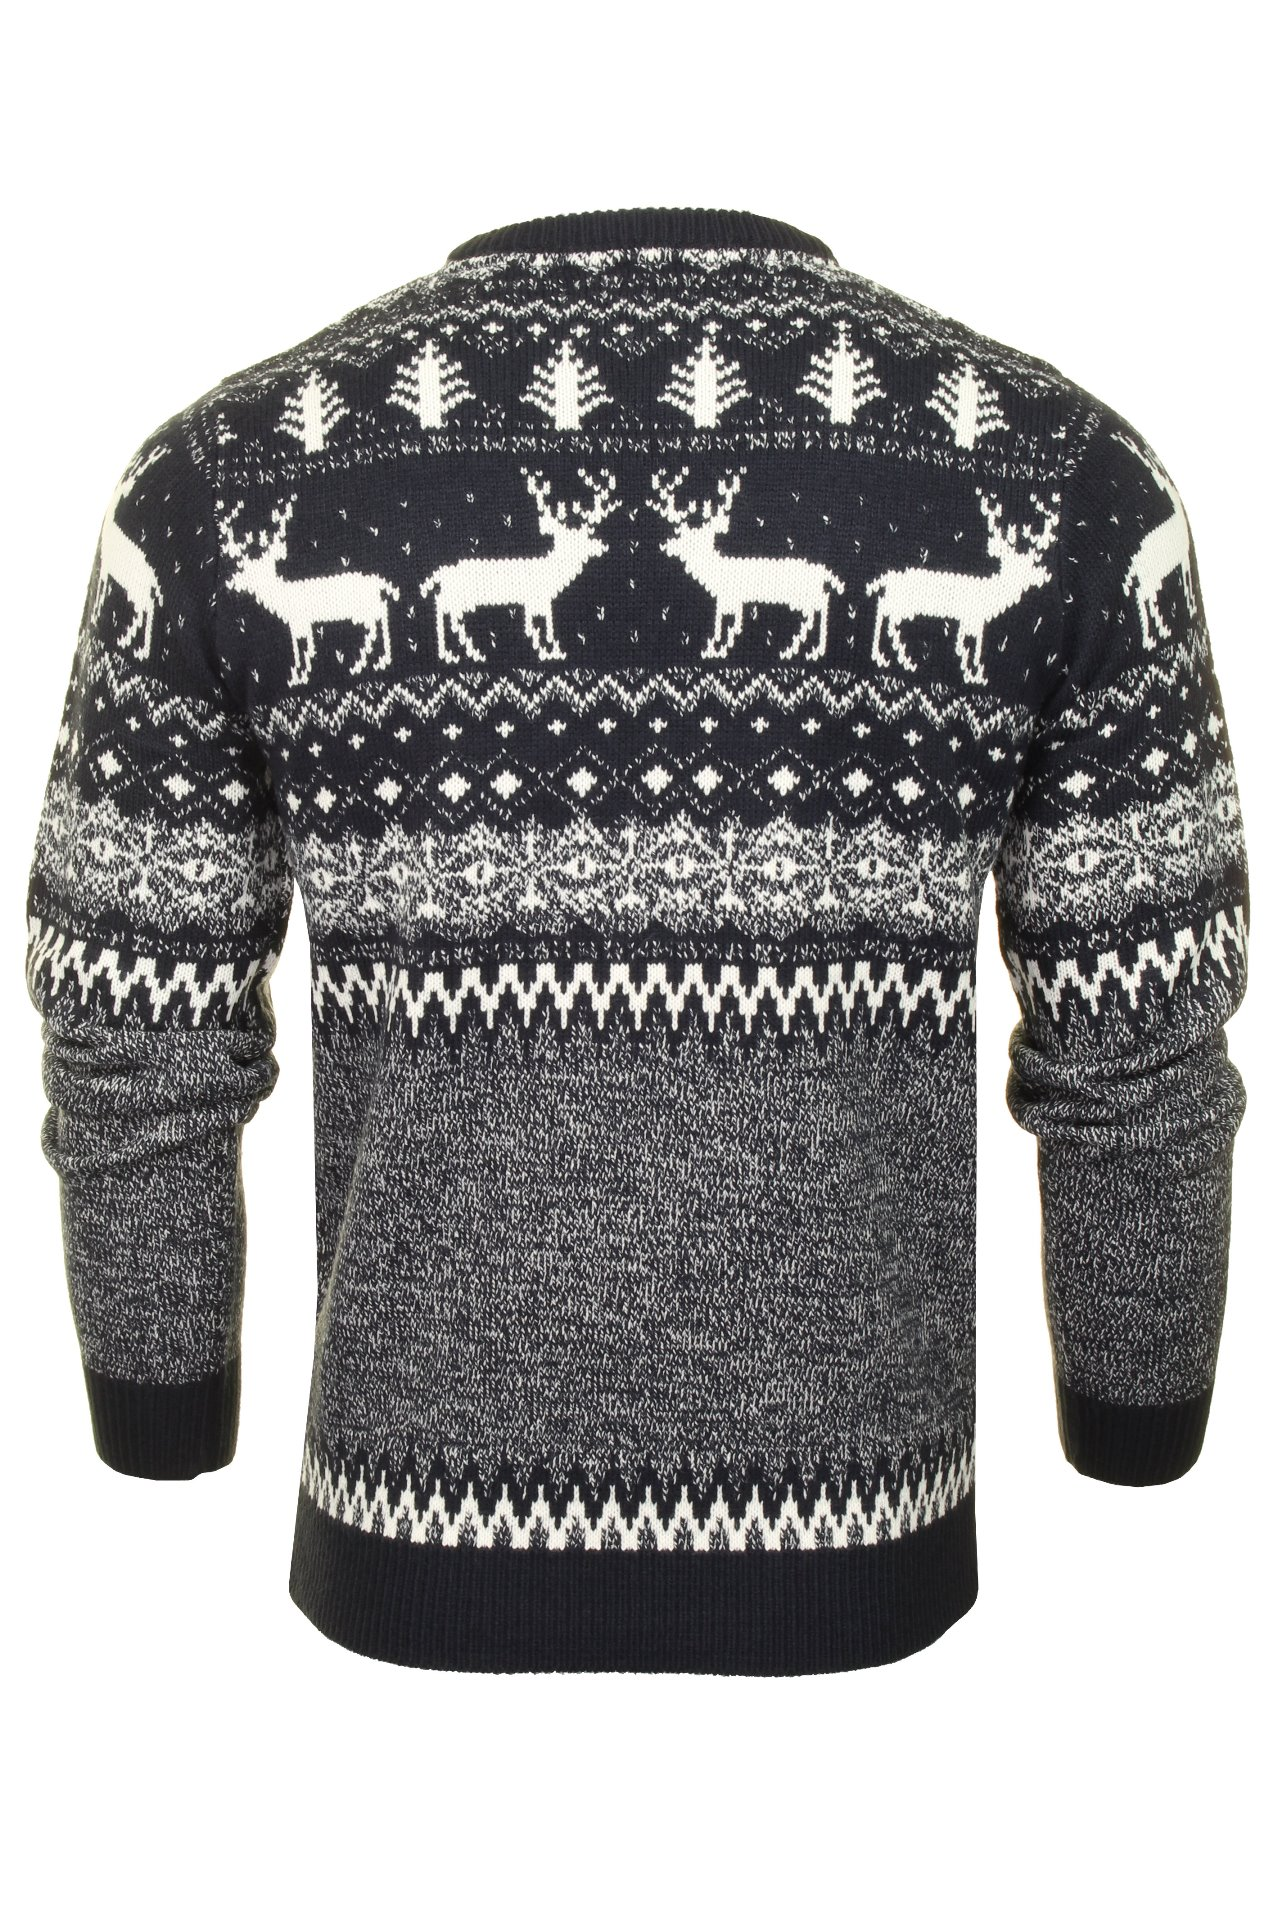 Mens-Xact-Christmas-Xmas-Jumper-039-Reindeer-Fairisle-Crew-039 thumbnail 8